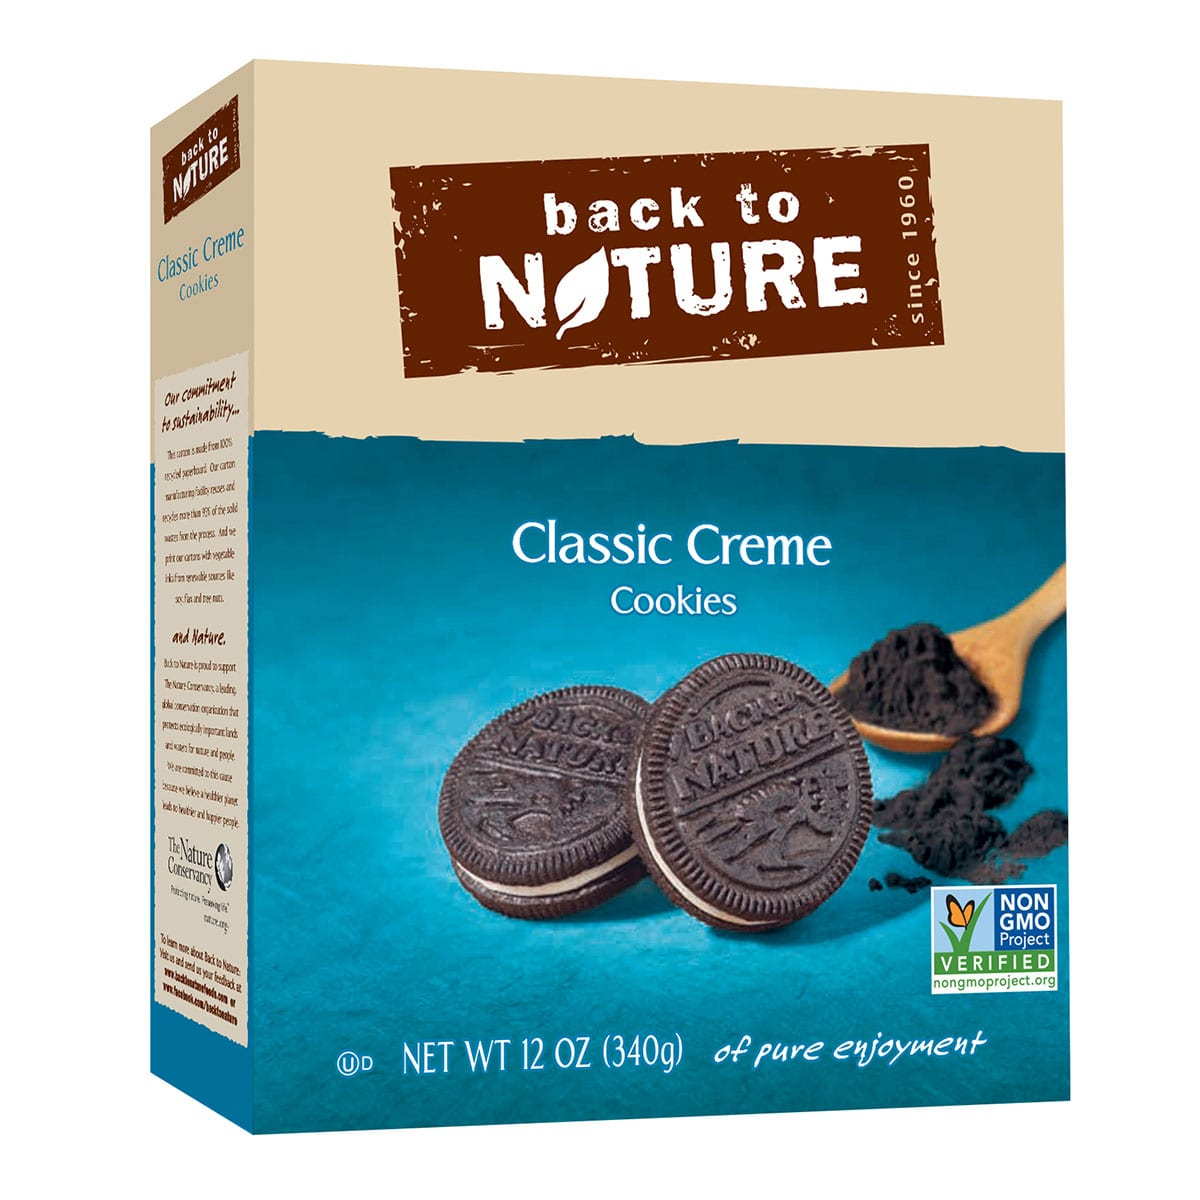 Classic Creme Cookies